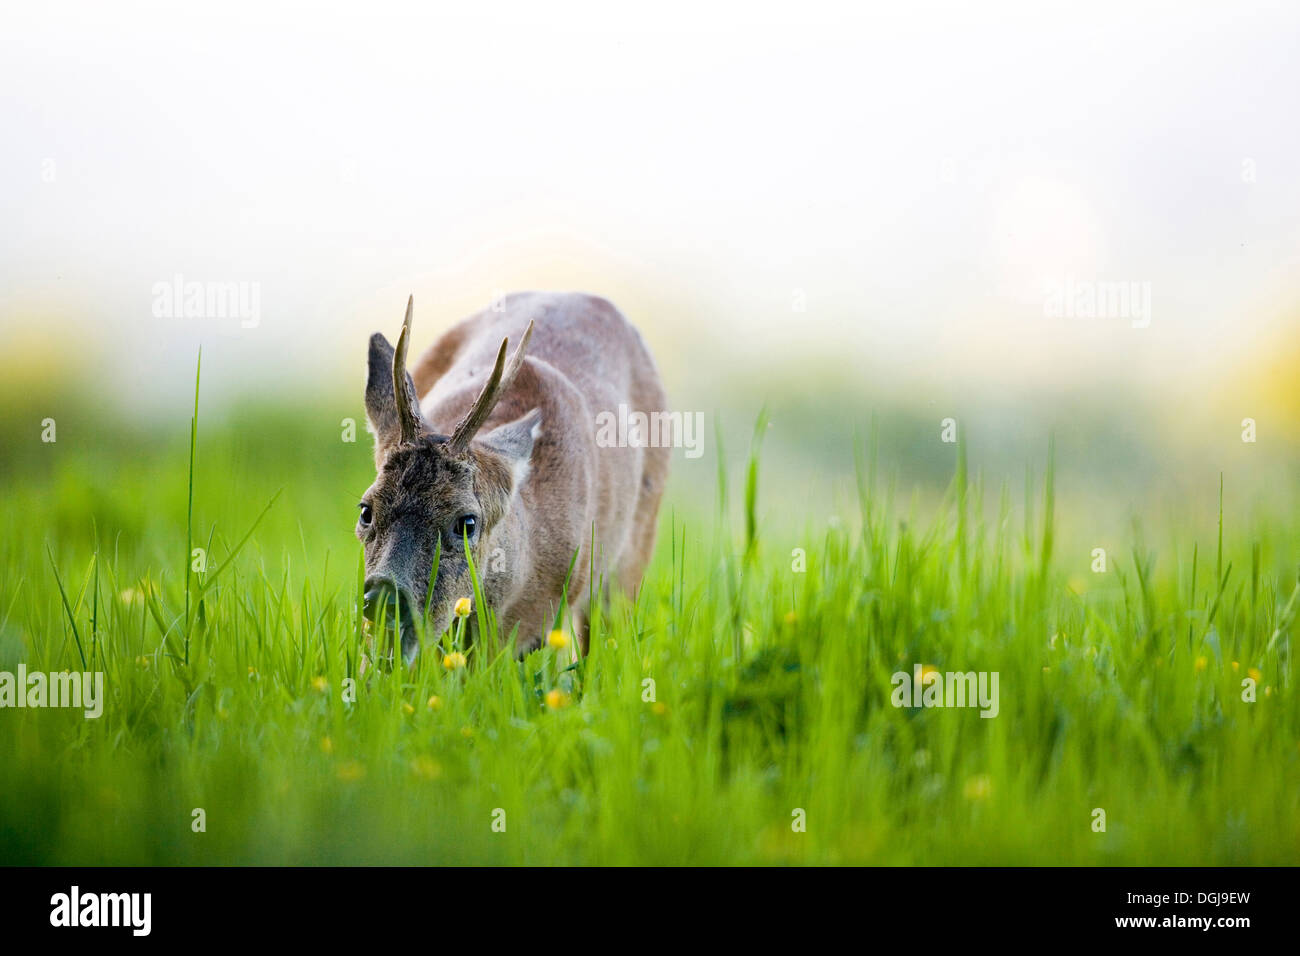 A roe deer munching on fresh pastures. - Stock Image